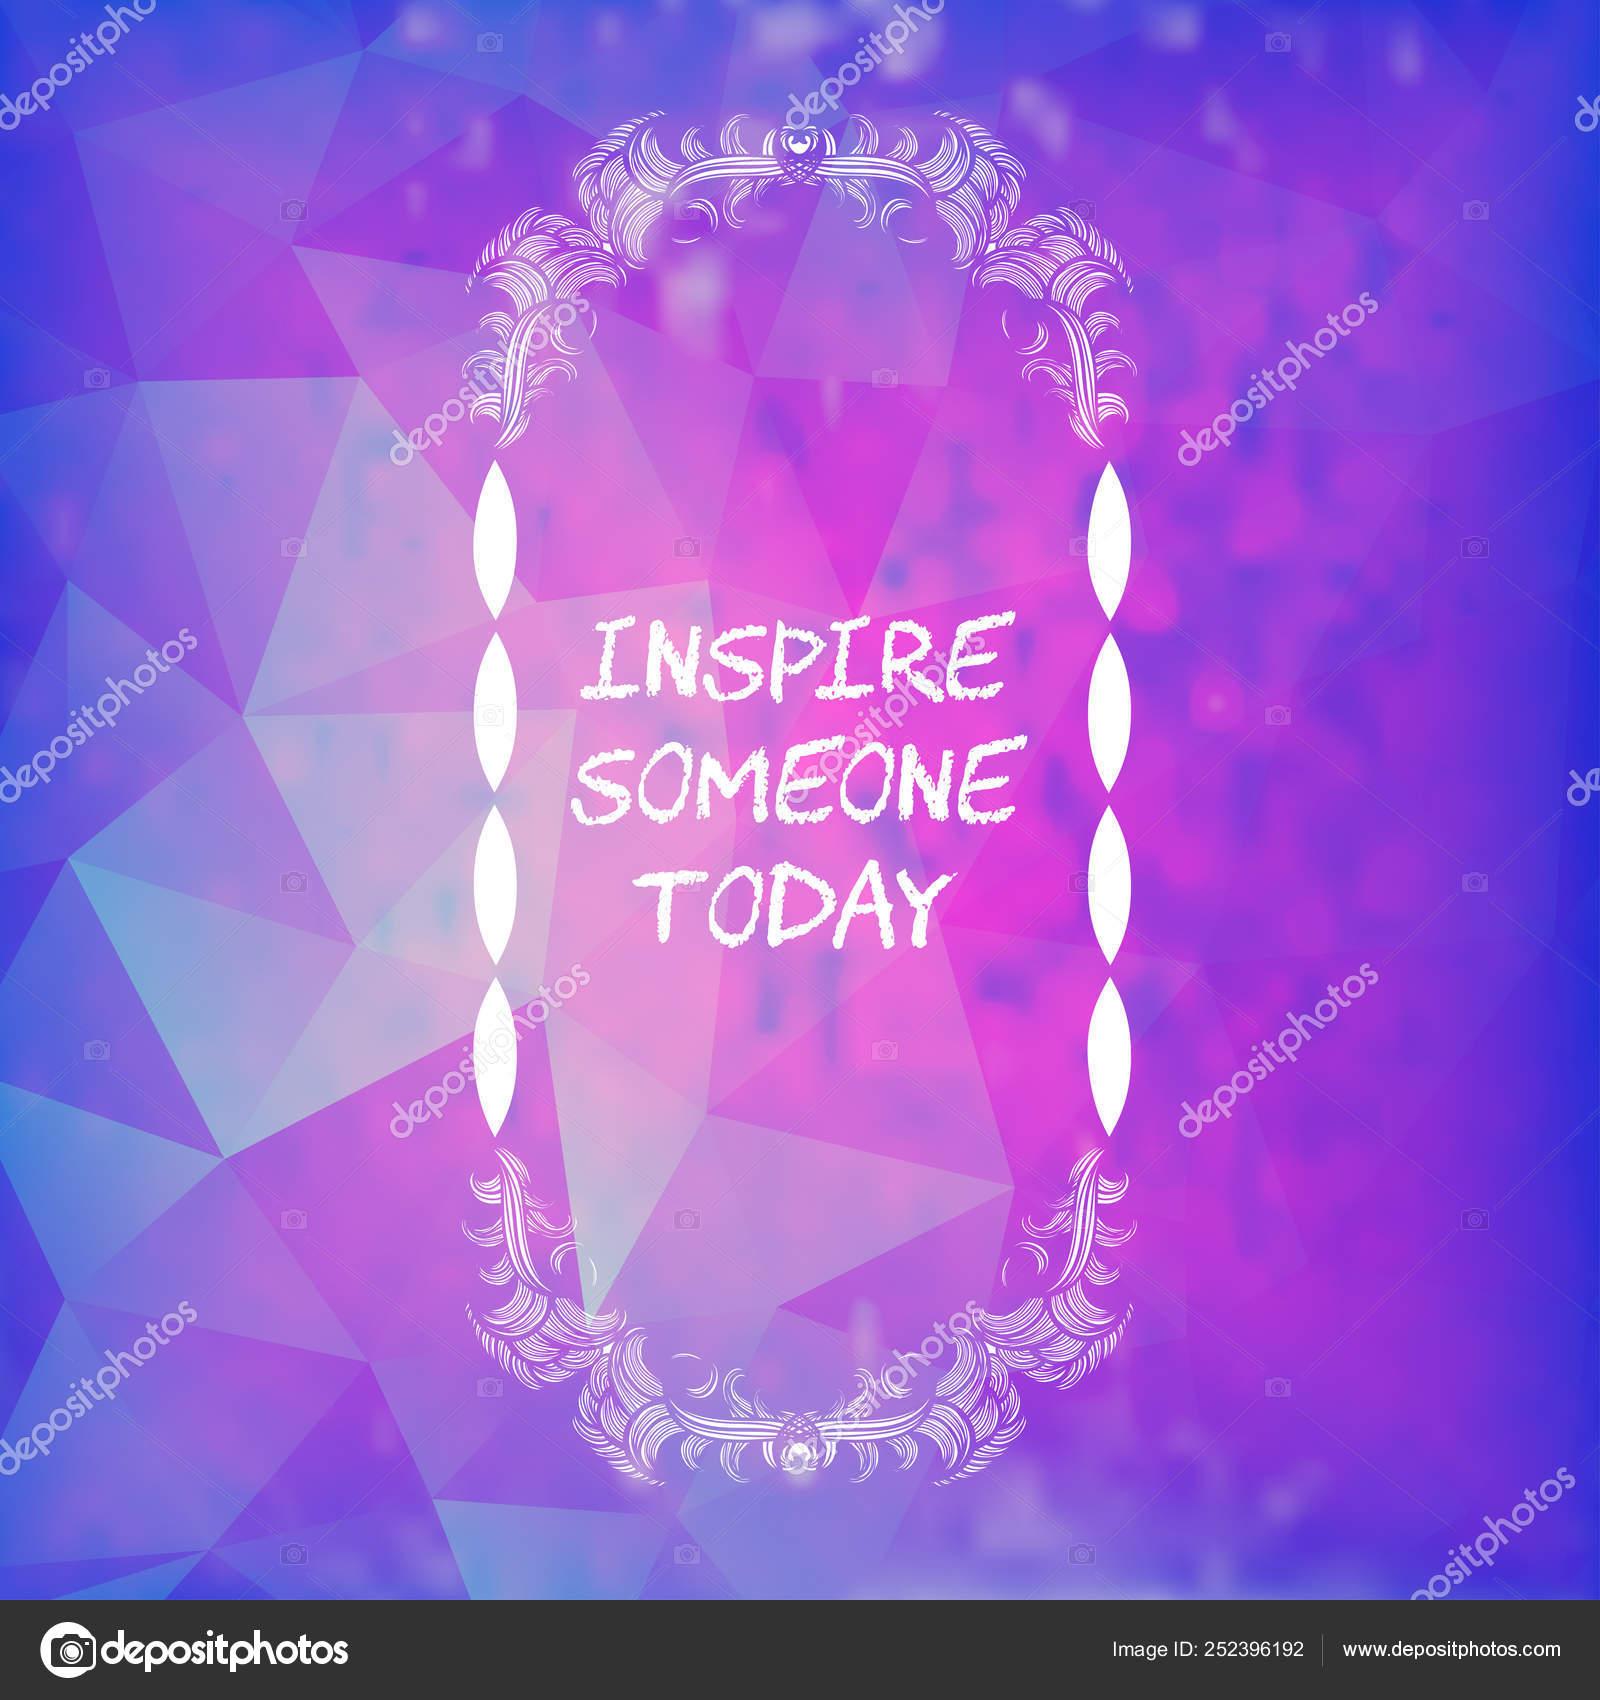 Tarjeta Decorativa Con Frase Motivacional Inspirar A